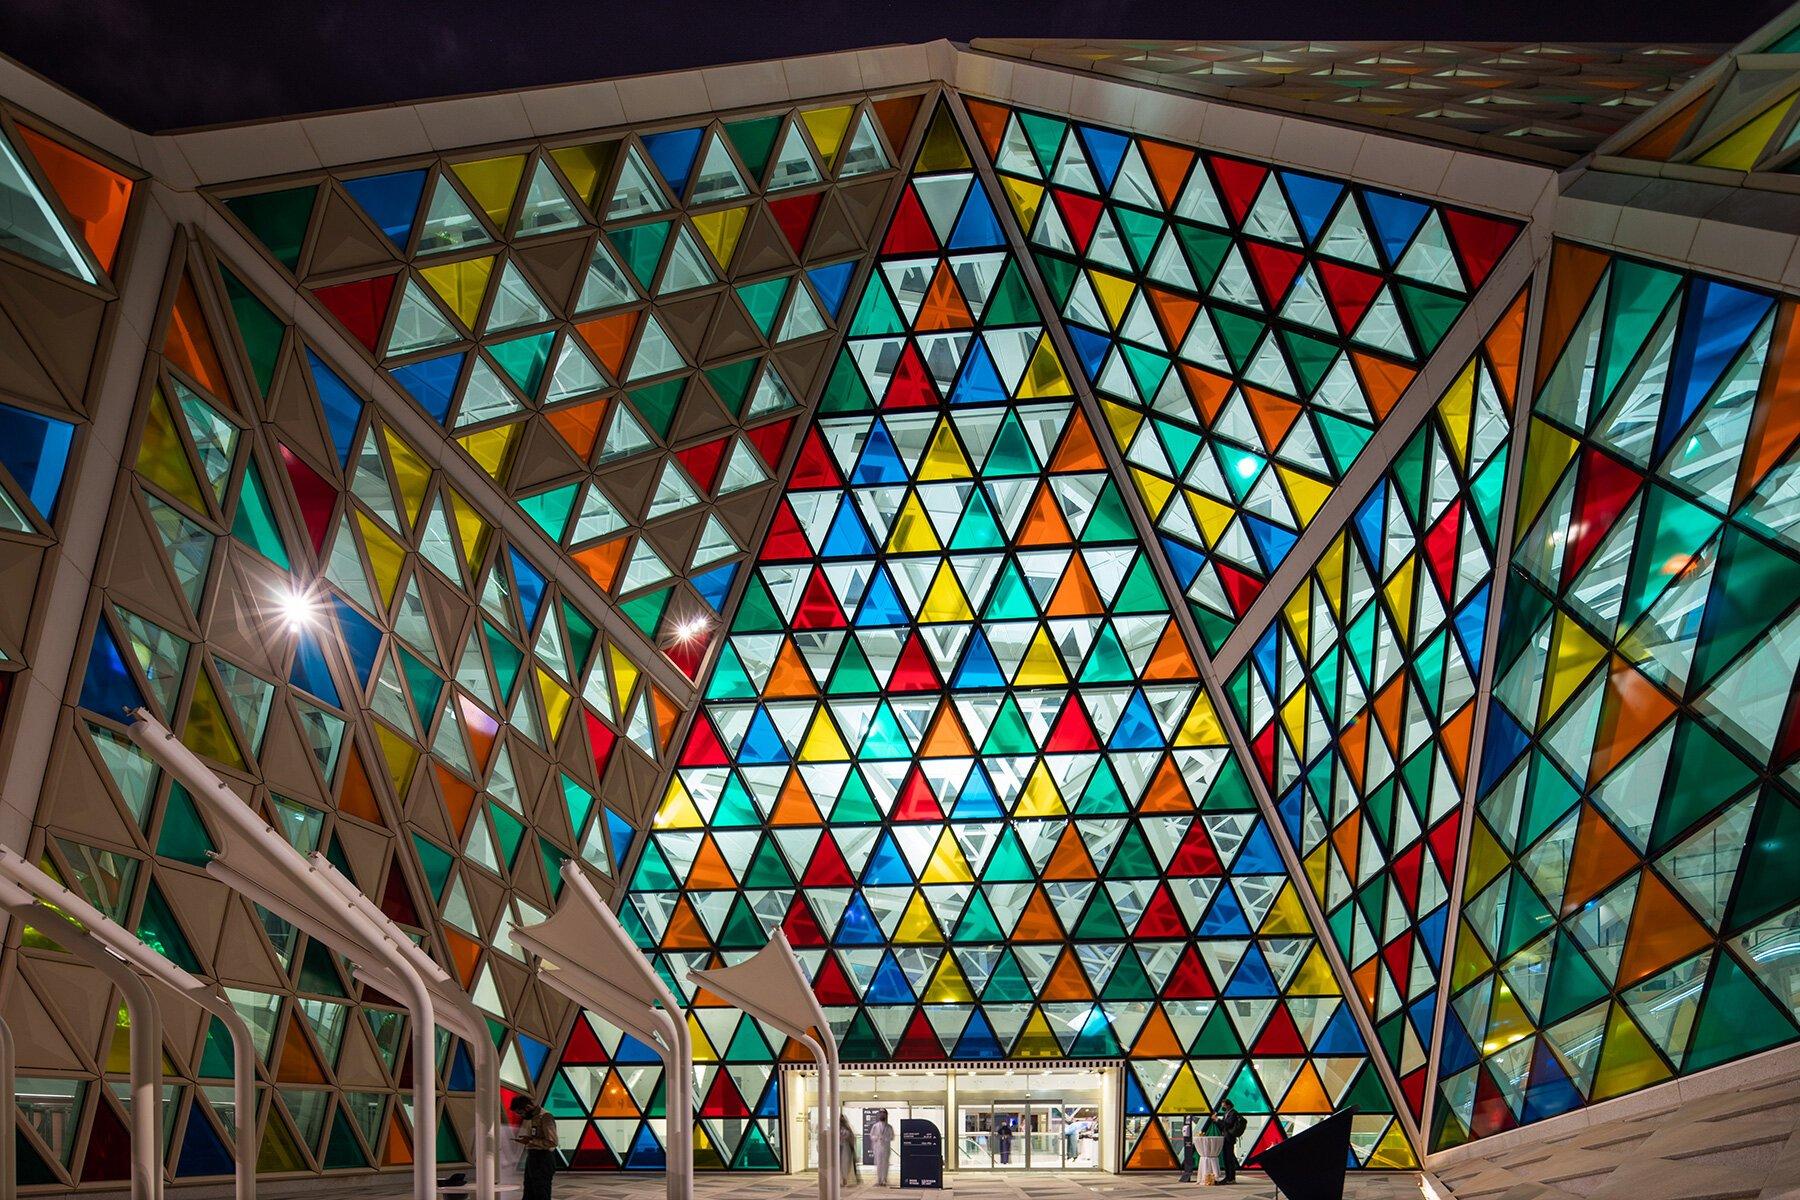 The Noor Riyadh light installation festival lights up the Saudi capital